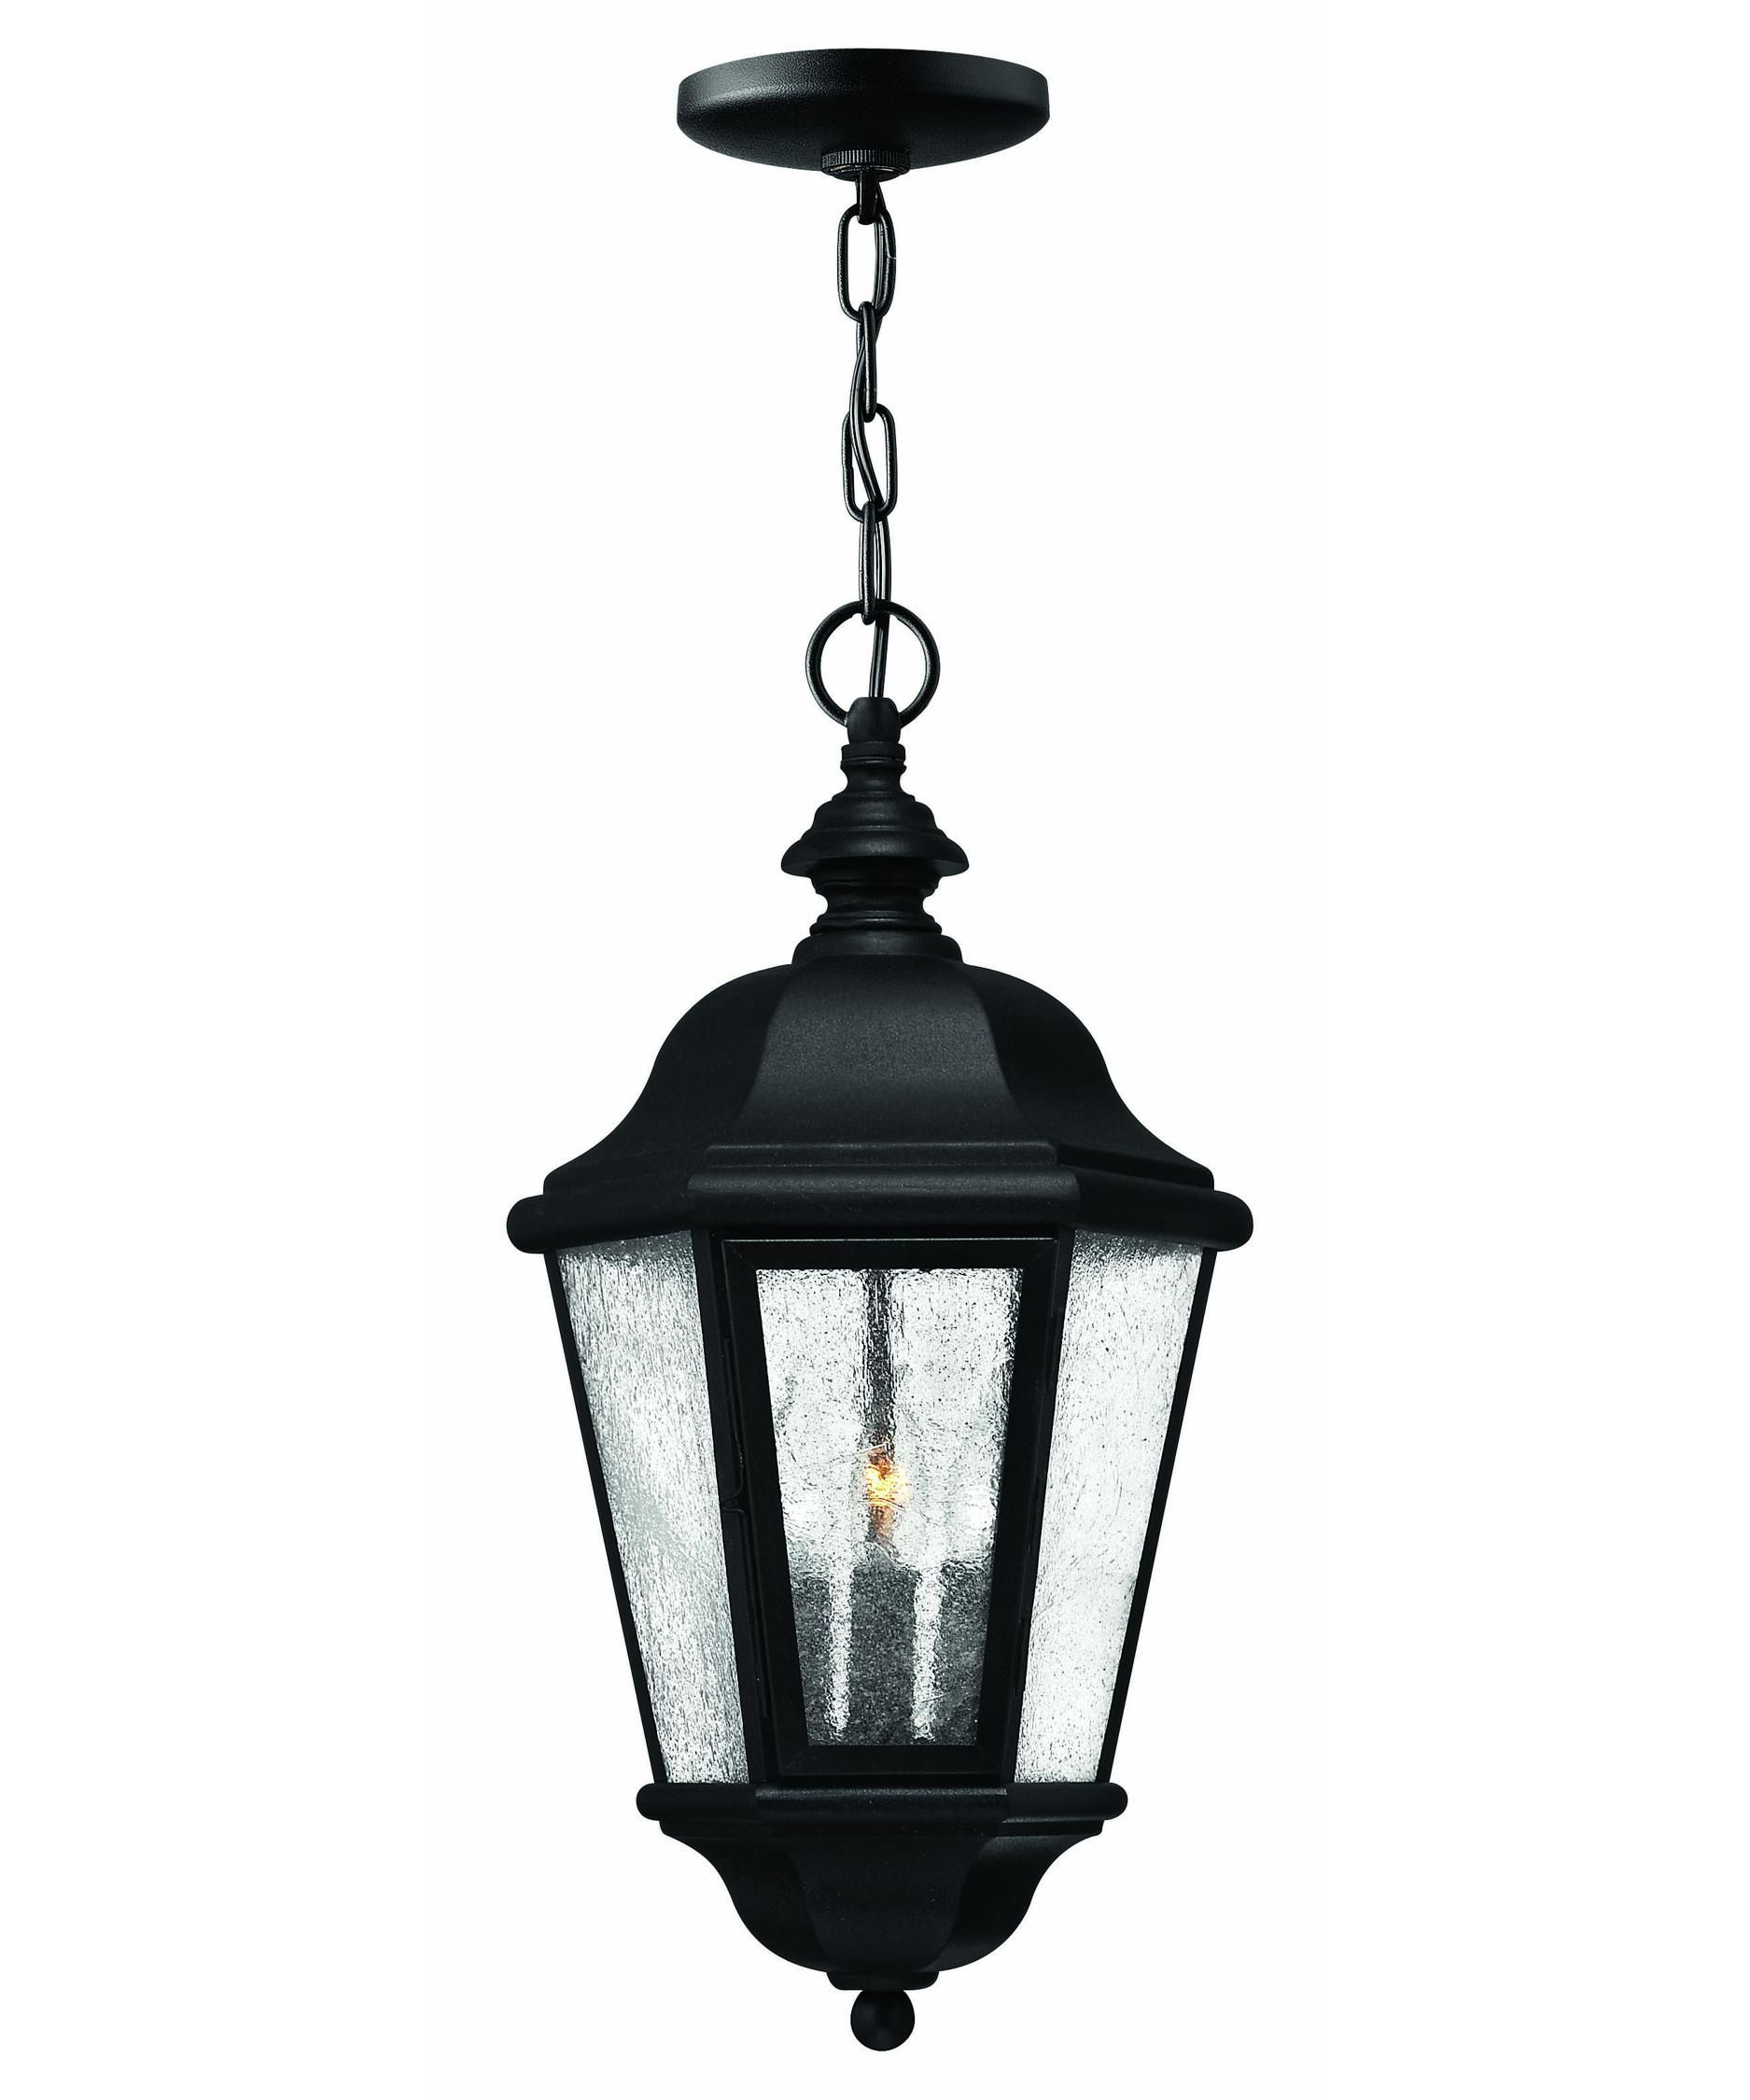 Outdoor pendant light fixtures httpdeai rankfo pinterest outdoor pendant light fixtures lantern arubaitofo Image collections